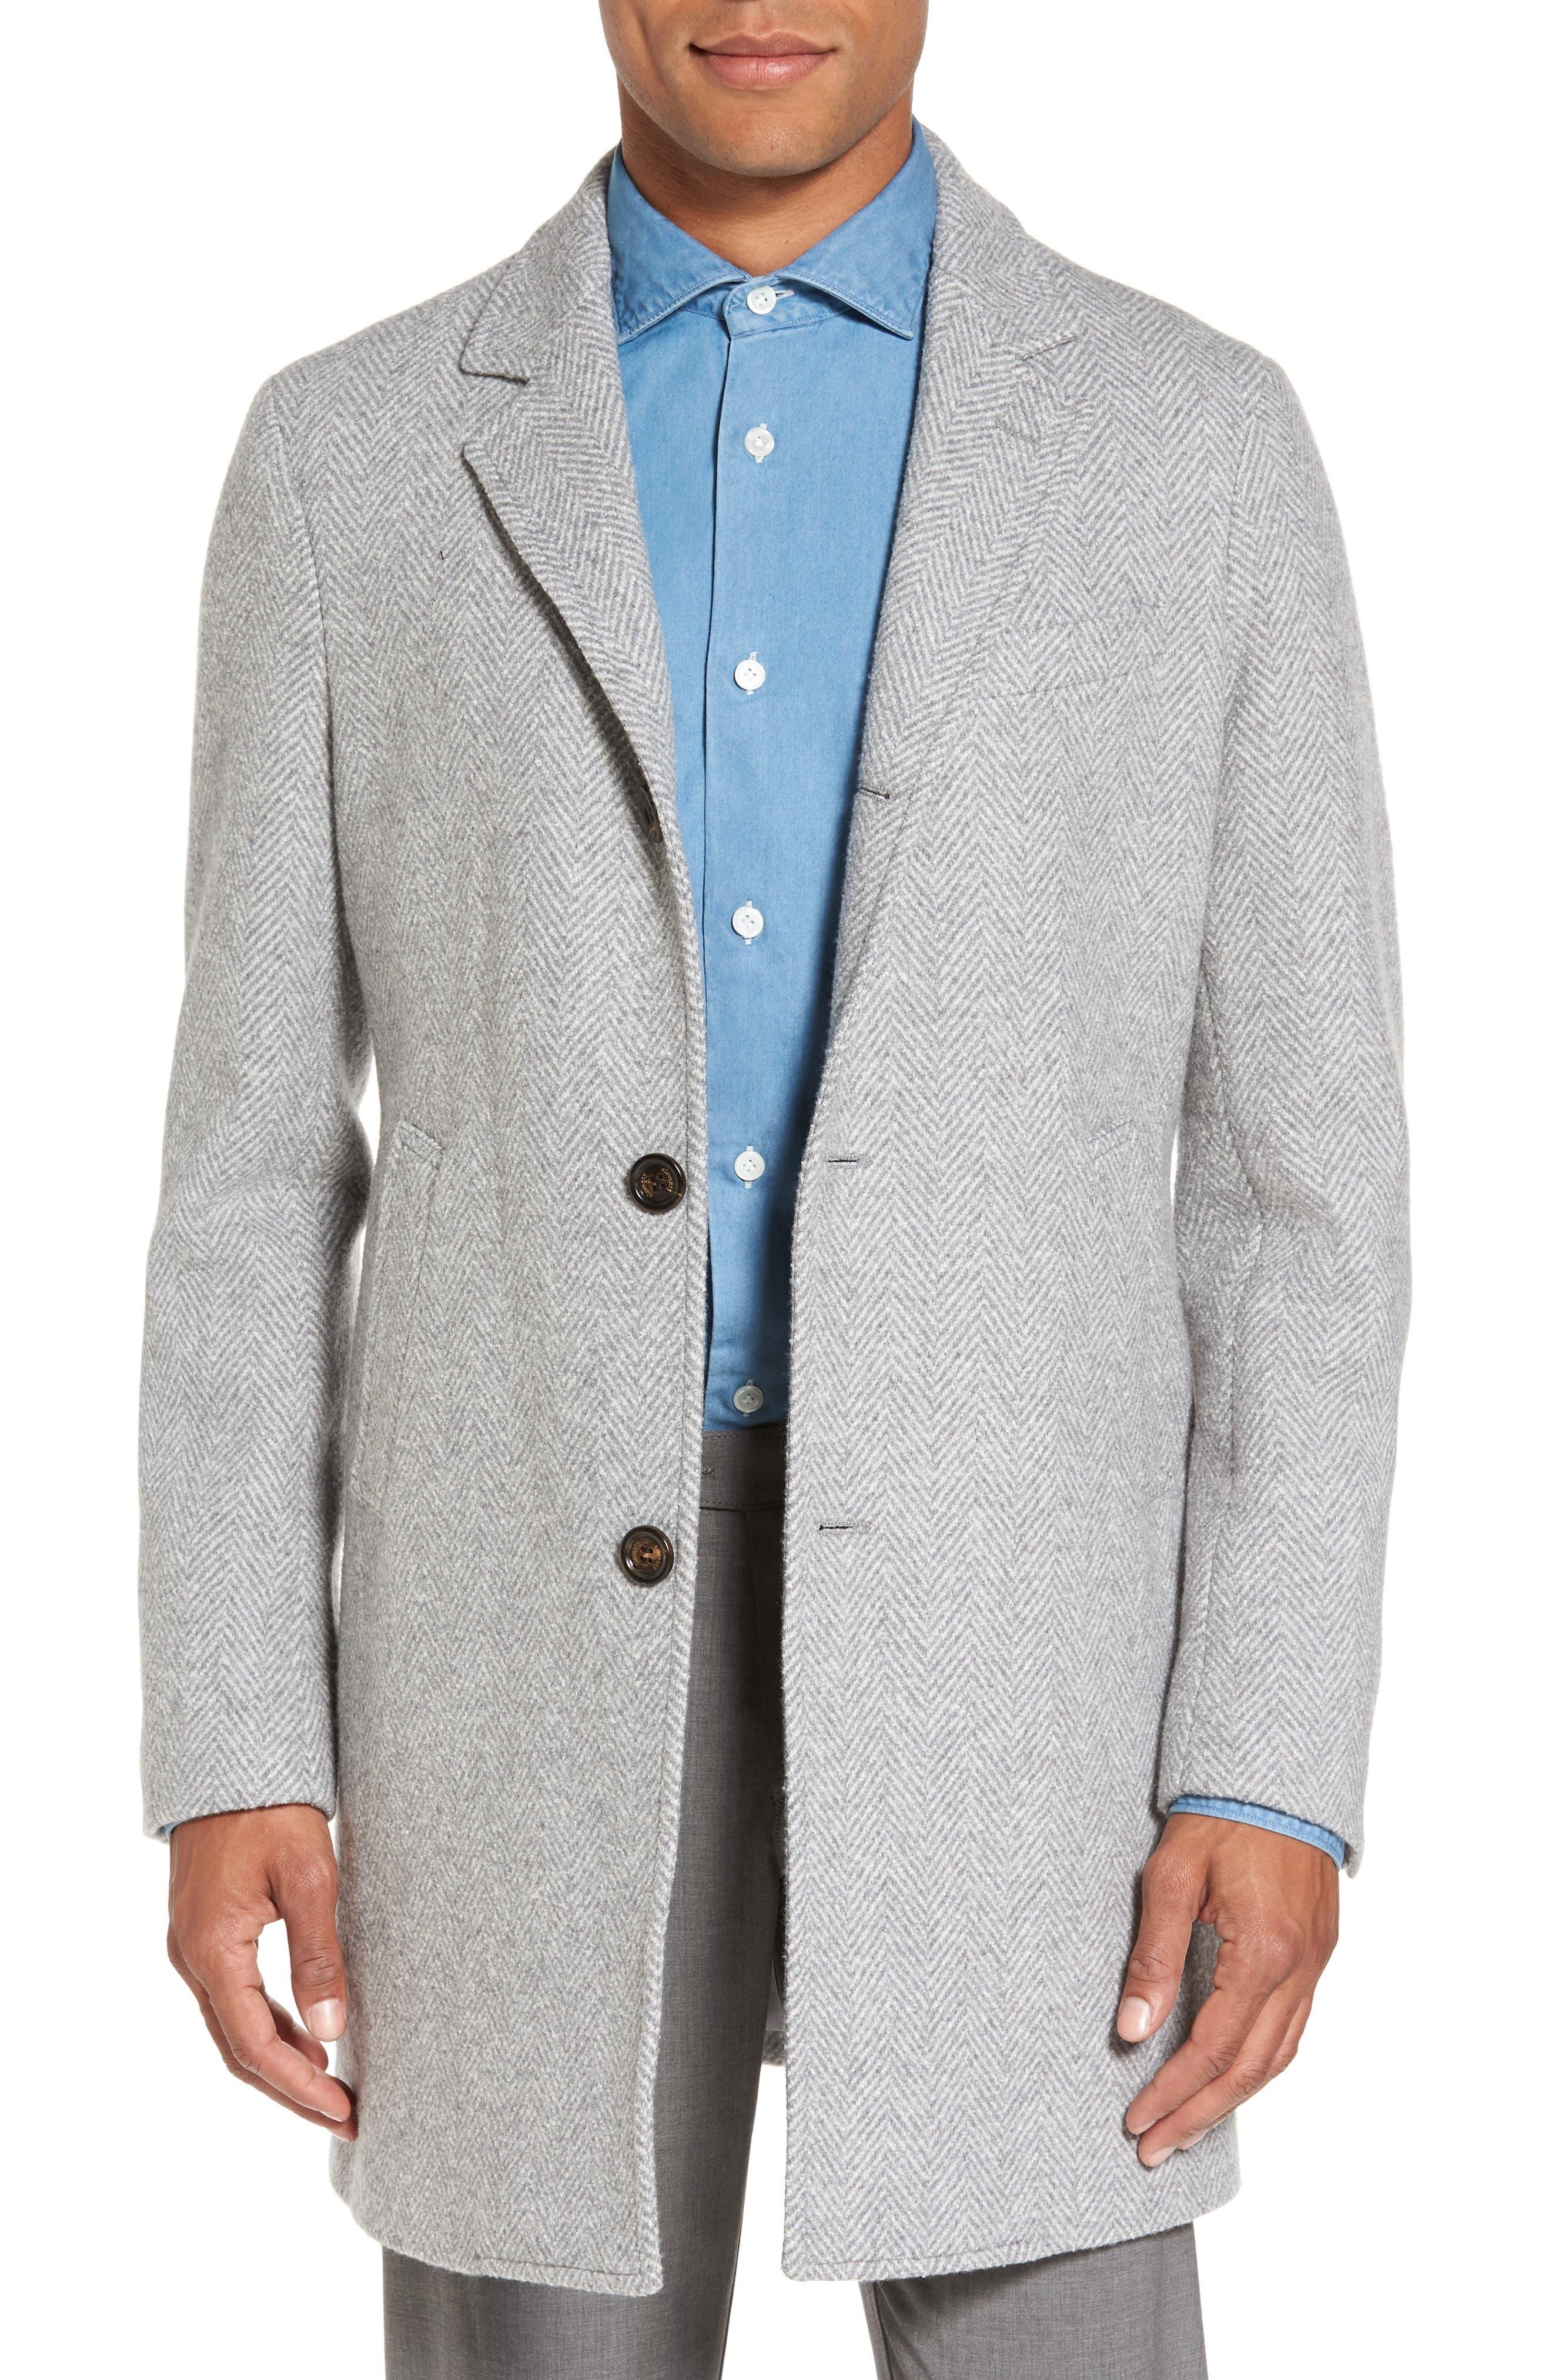 Herringbone Wool Blend Overcoat,                         Main,                         color, Light Grey